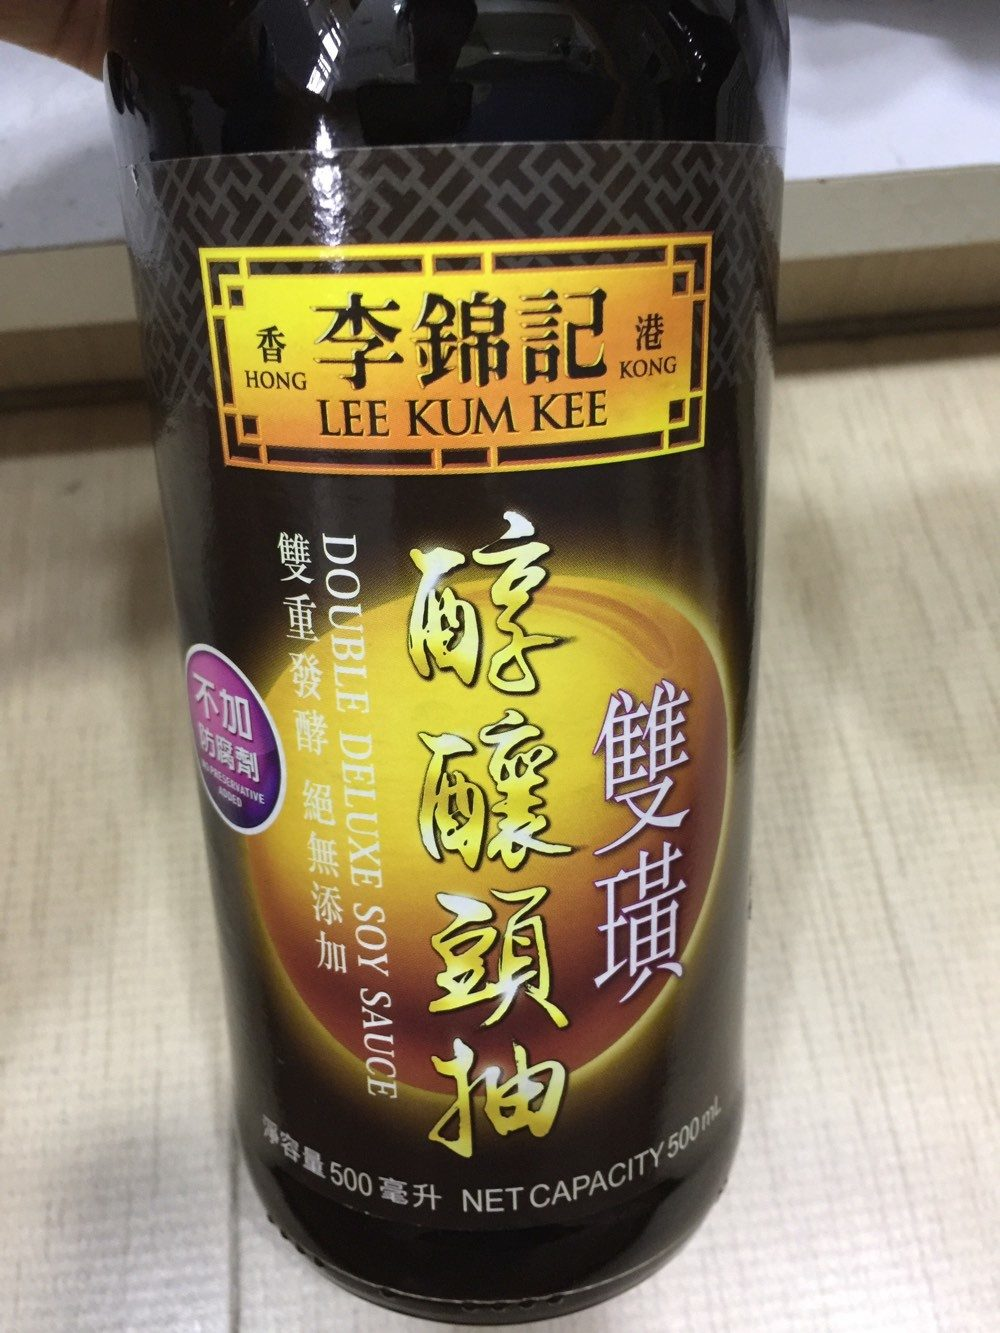 Lee Kum Kee Double Deluxe Soy Sauce - Produit - fr